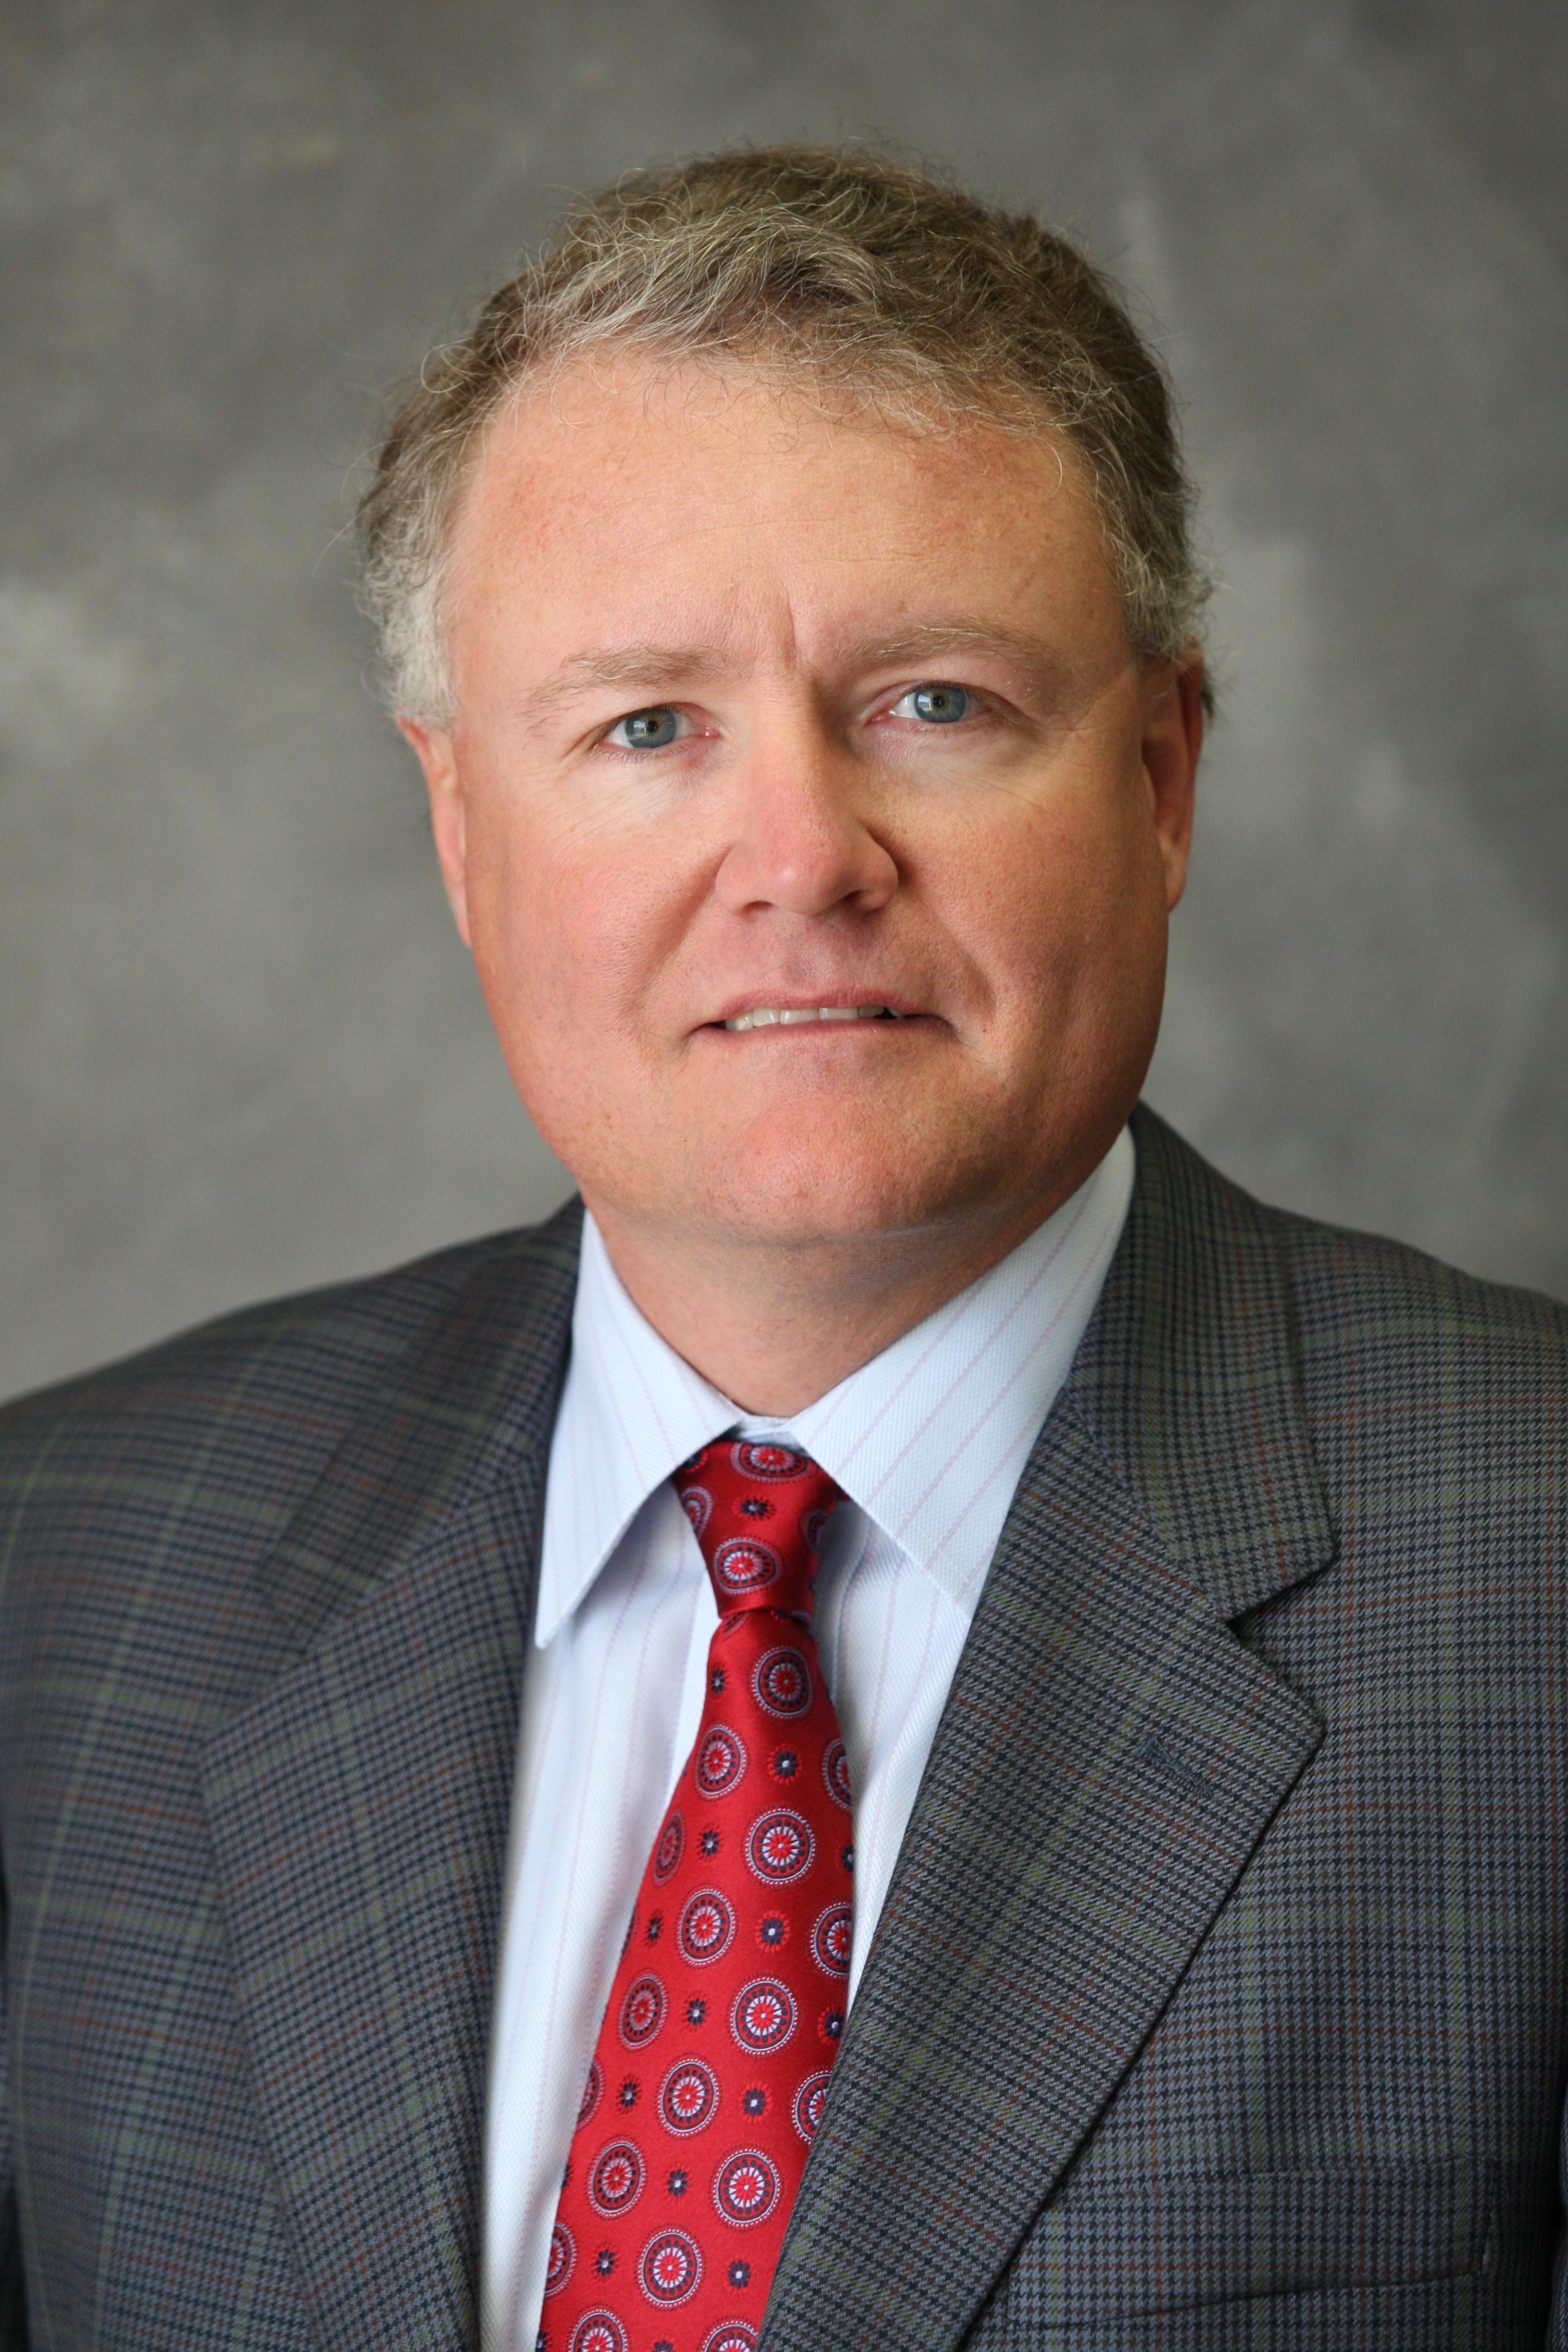 Joseph Cook, IV, MD